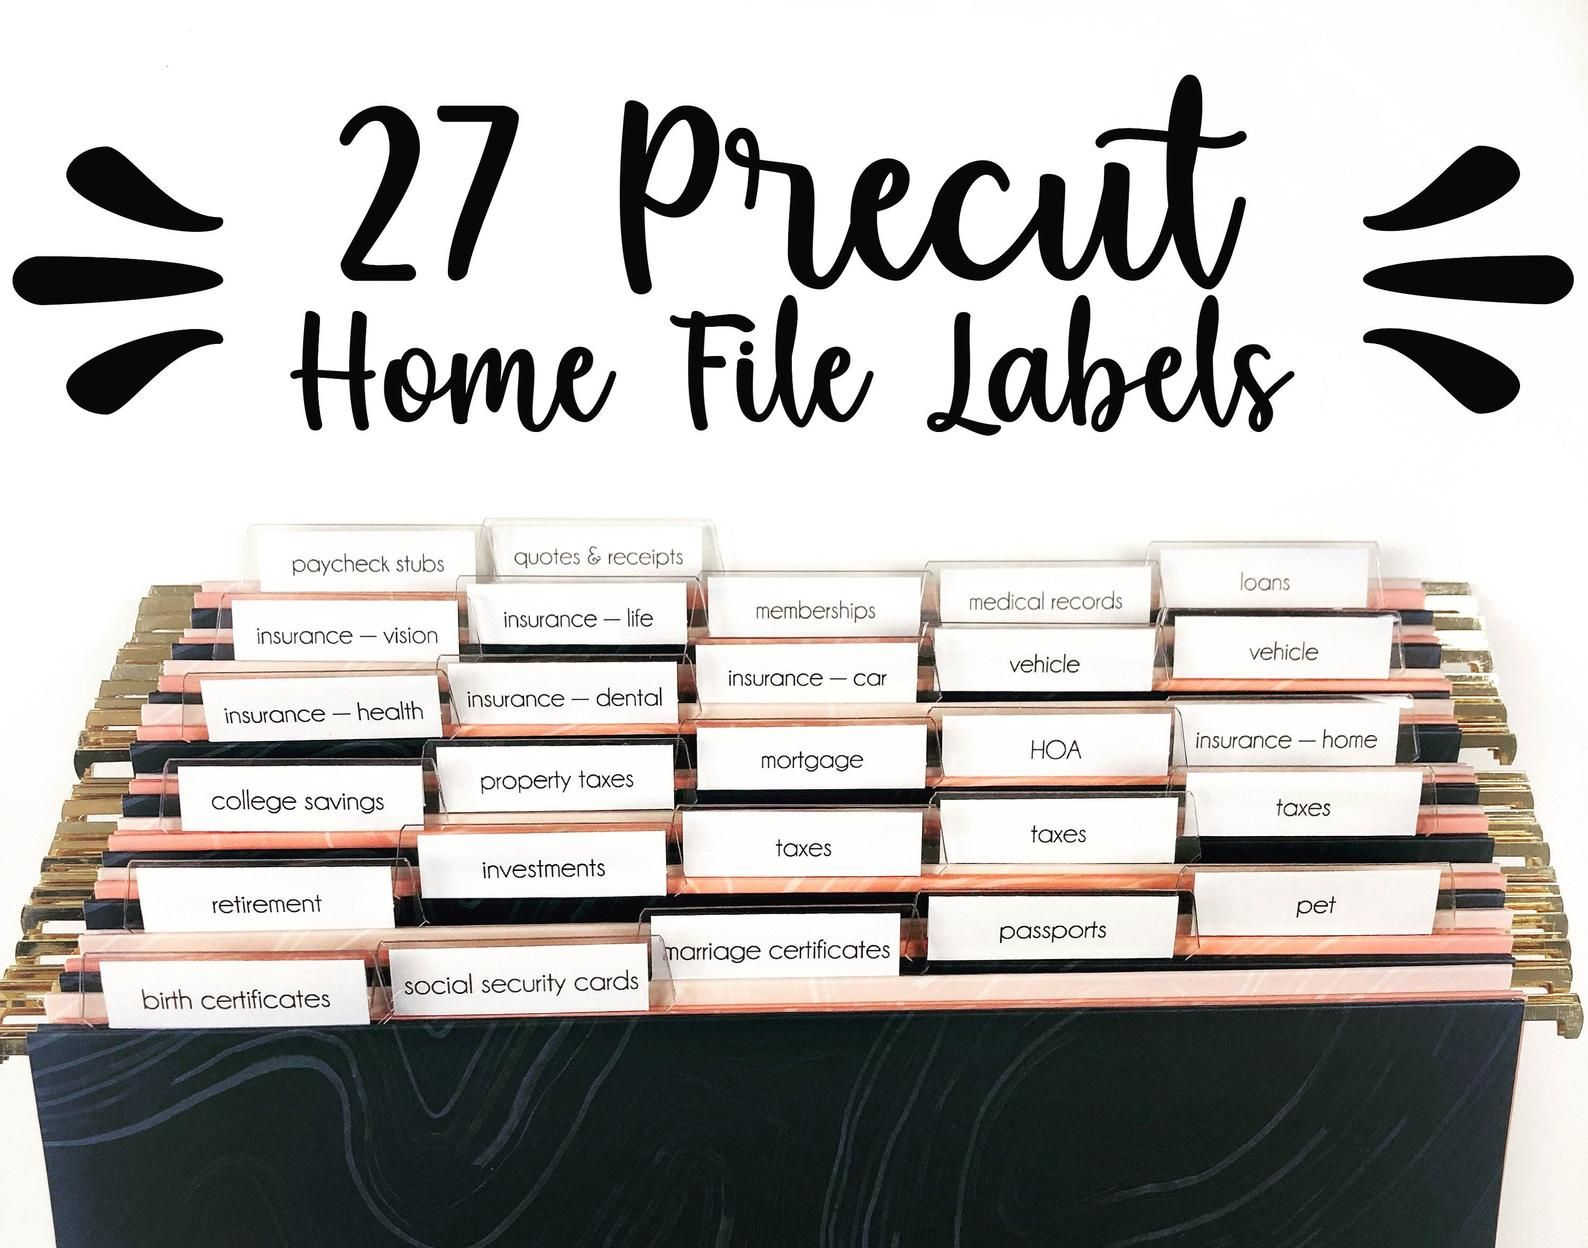 Precut Home Filing System Labels Home Office Home Organization Organize Home Storage File Cabinet File Storage Home Filing System File Folder Labels Folder Labels [ 1248 x 1588 Pixel ]